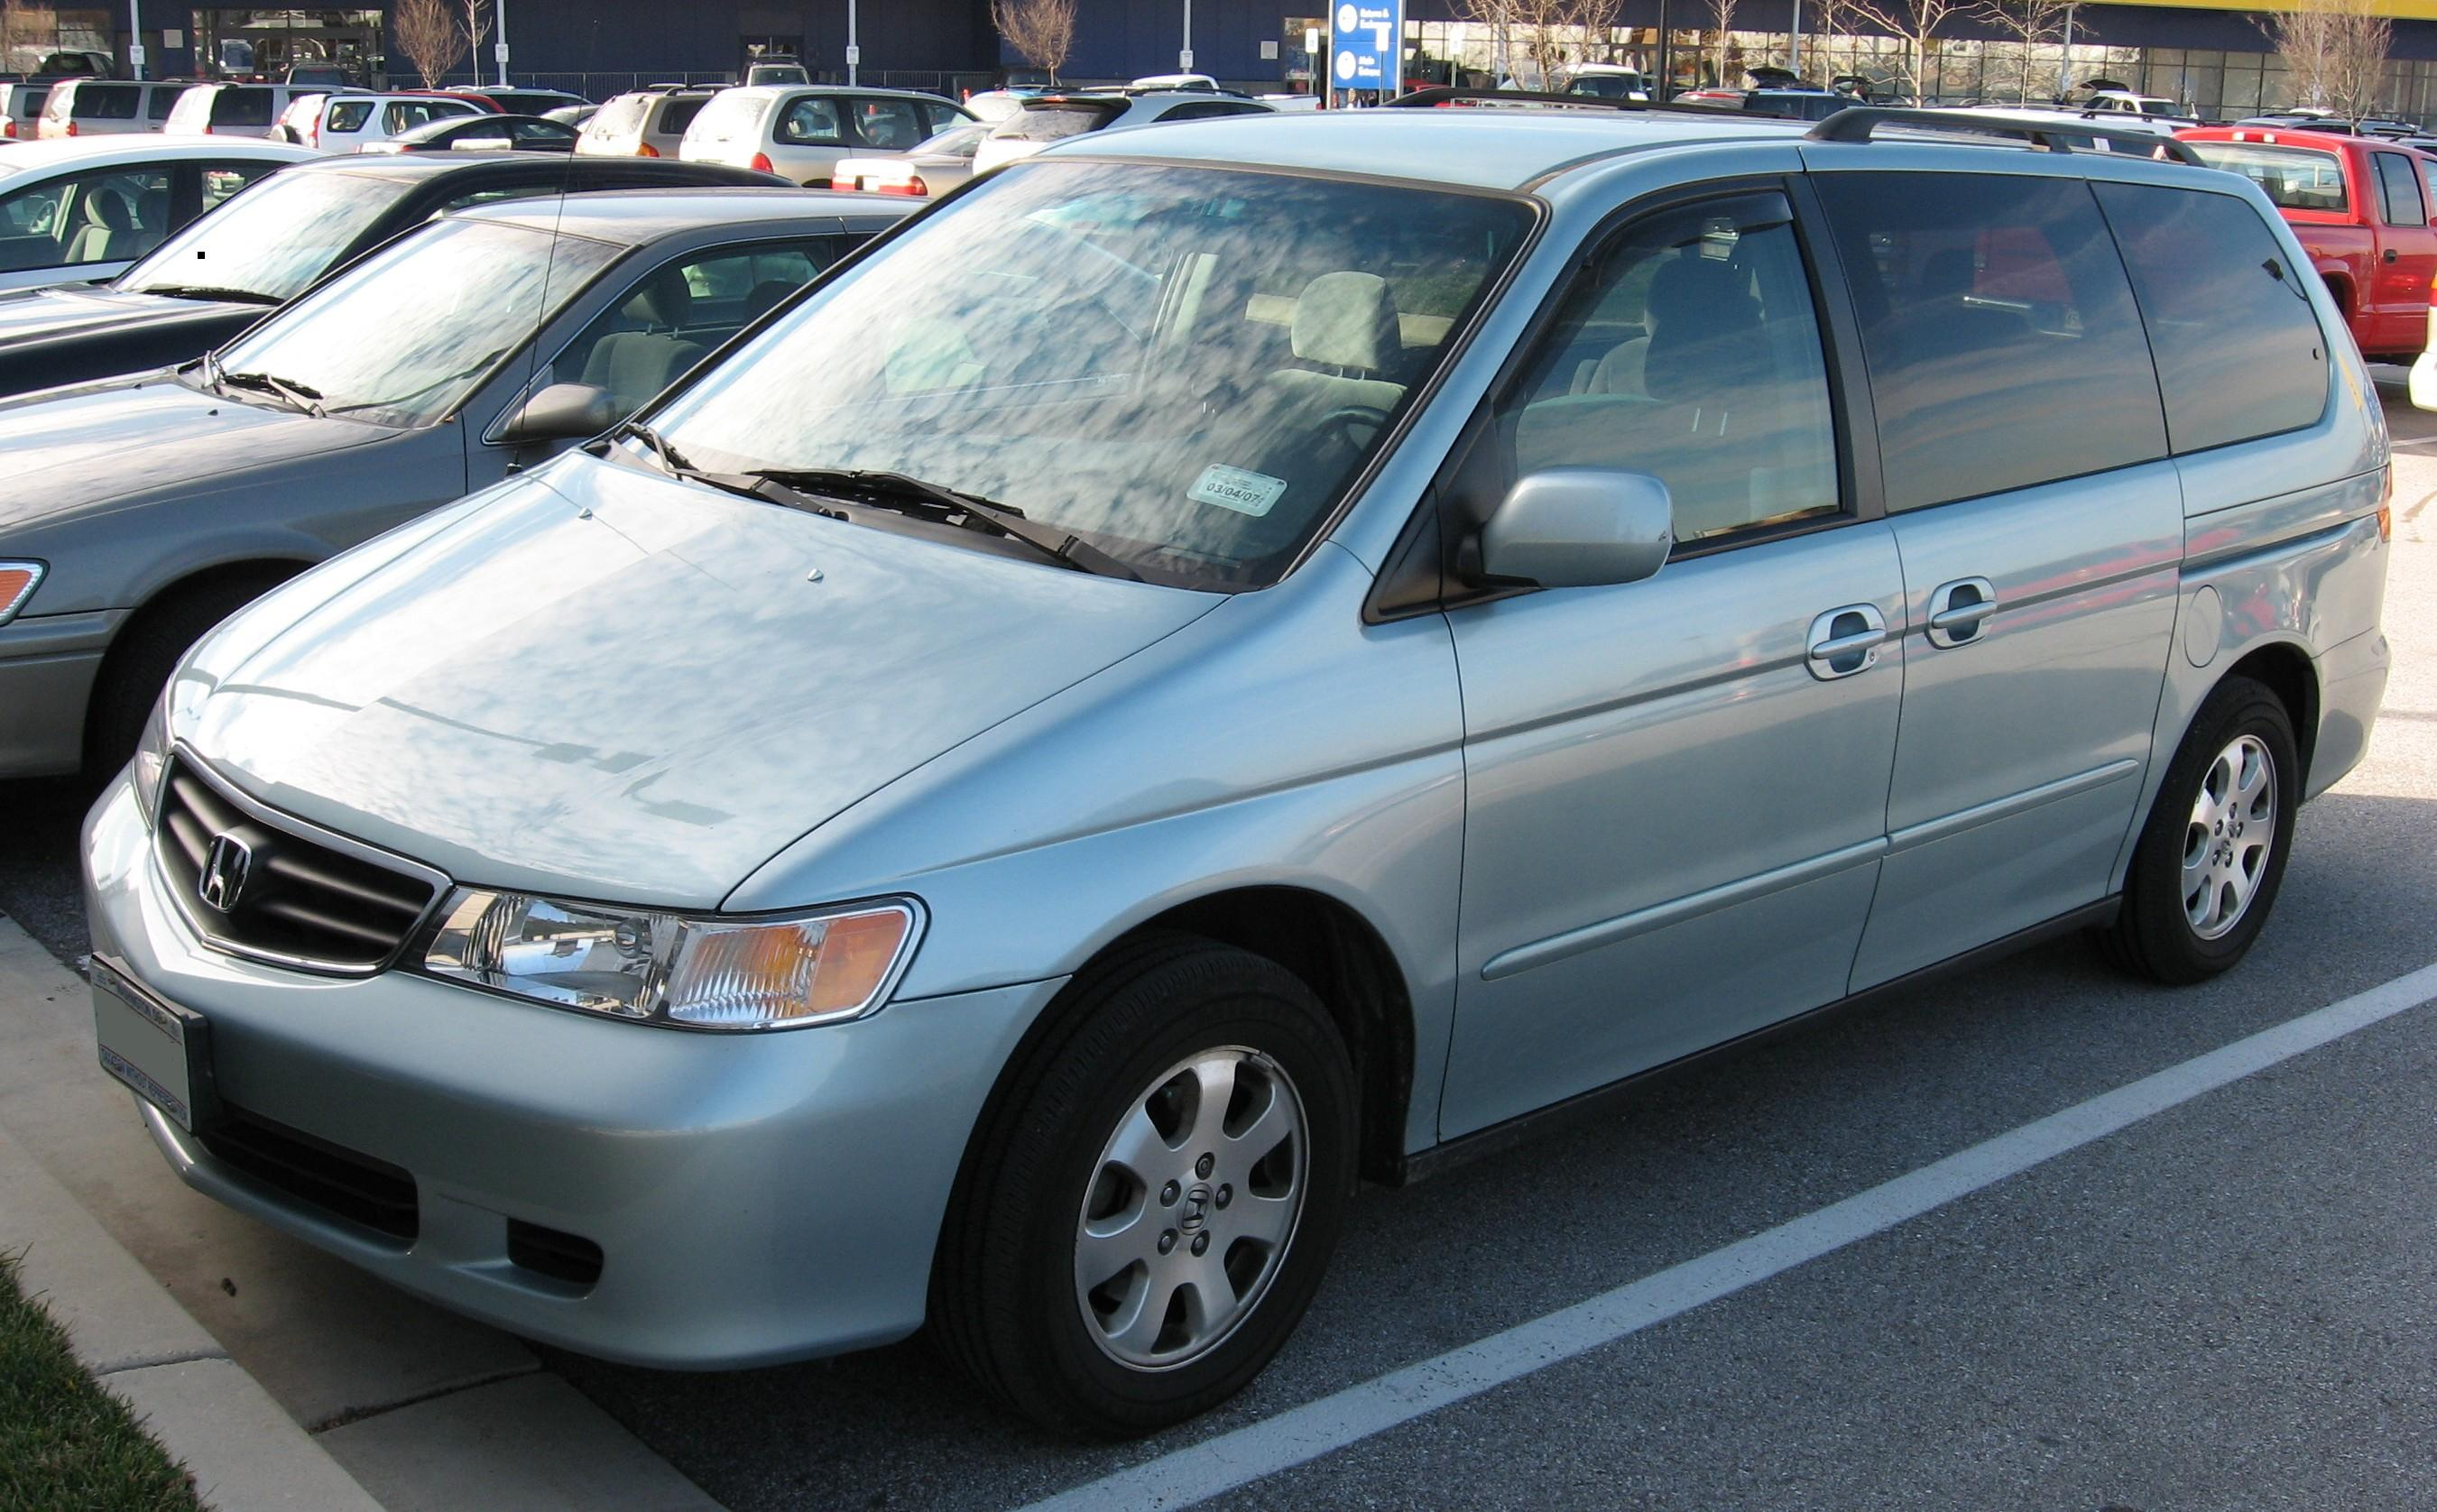 File:02-04 Honda Odyssey.jpg - Wikimedia Commons